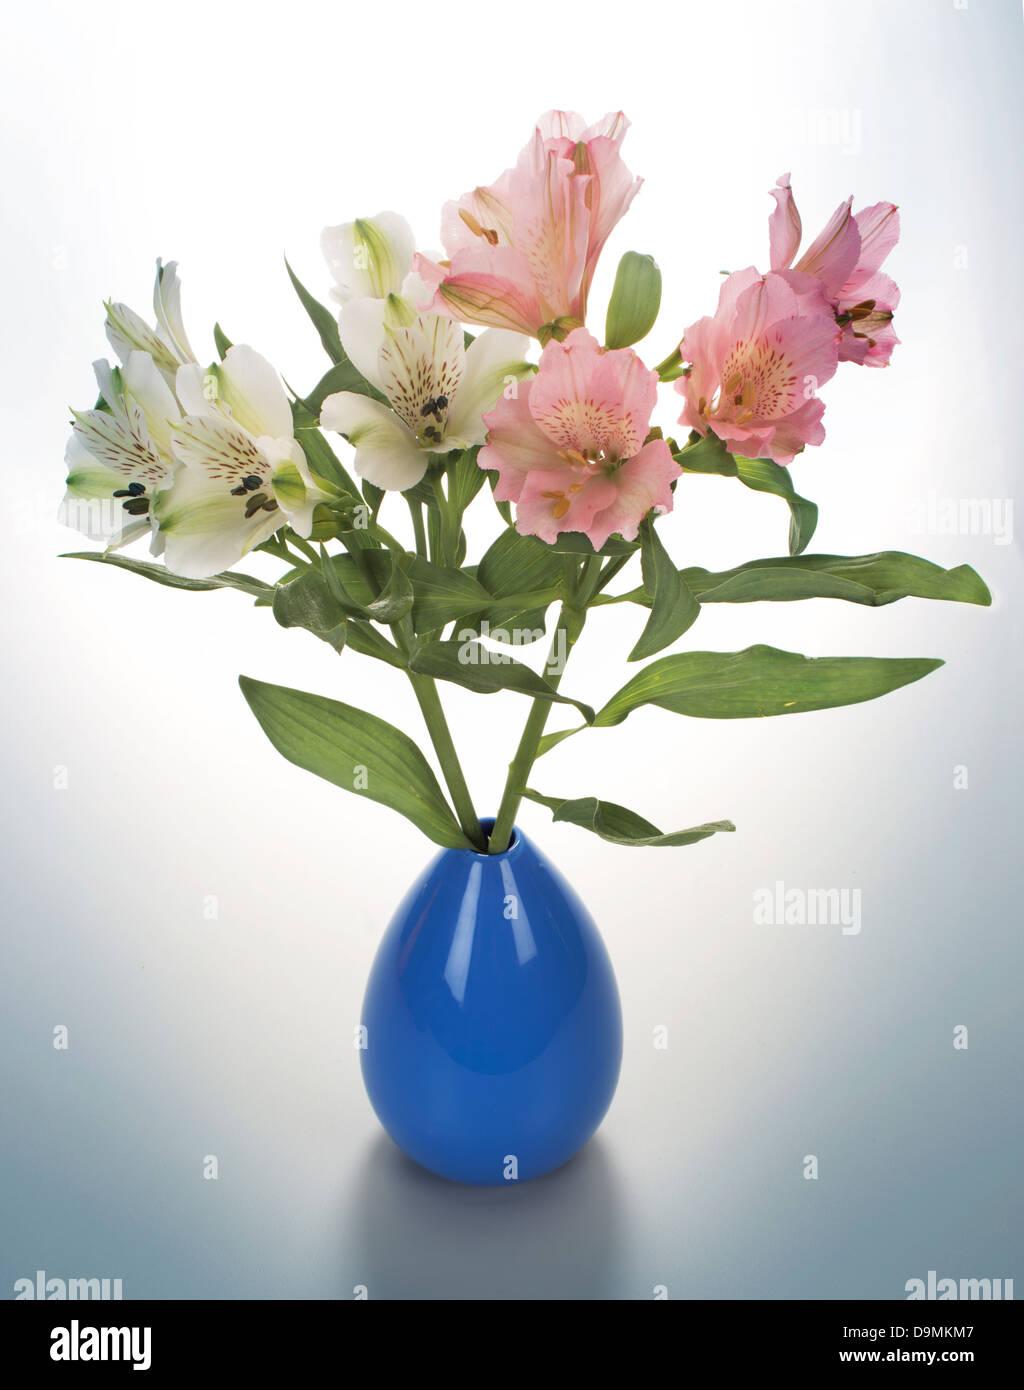 flowers in vase - Stock Image